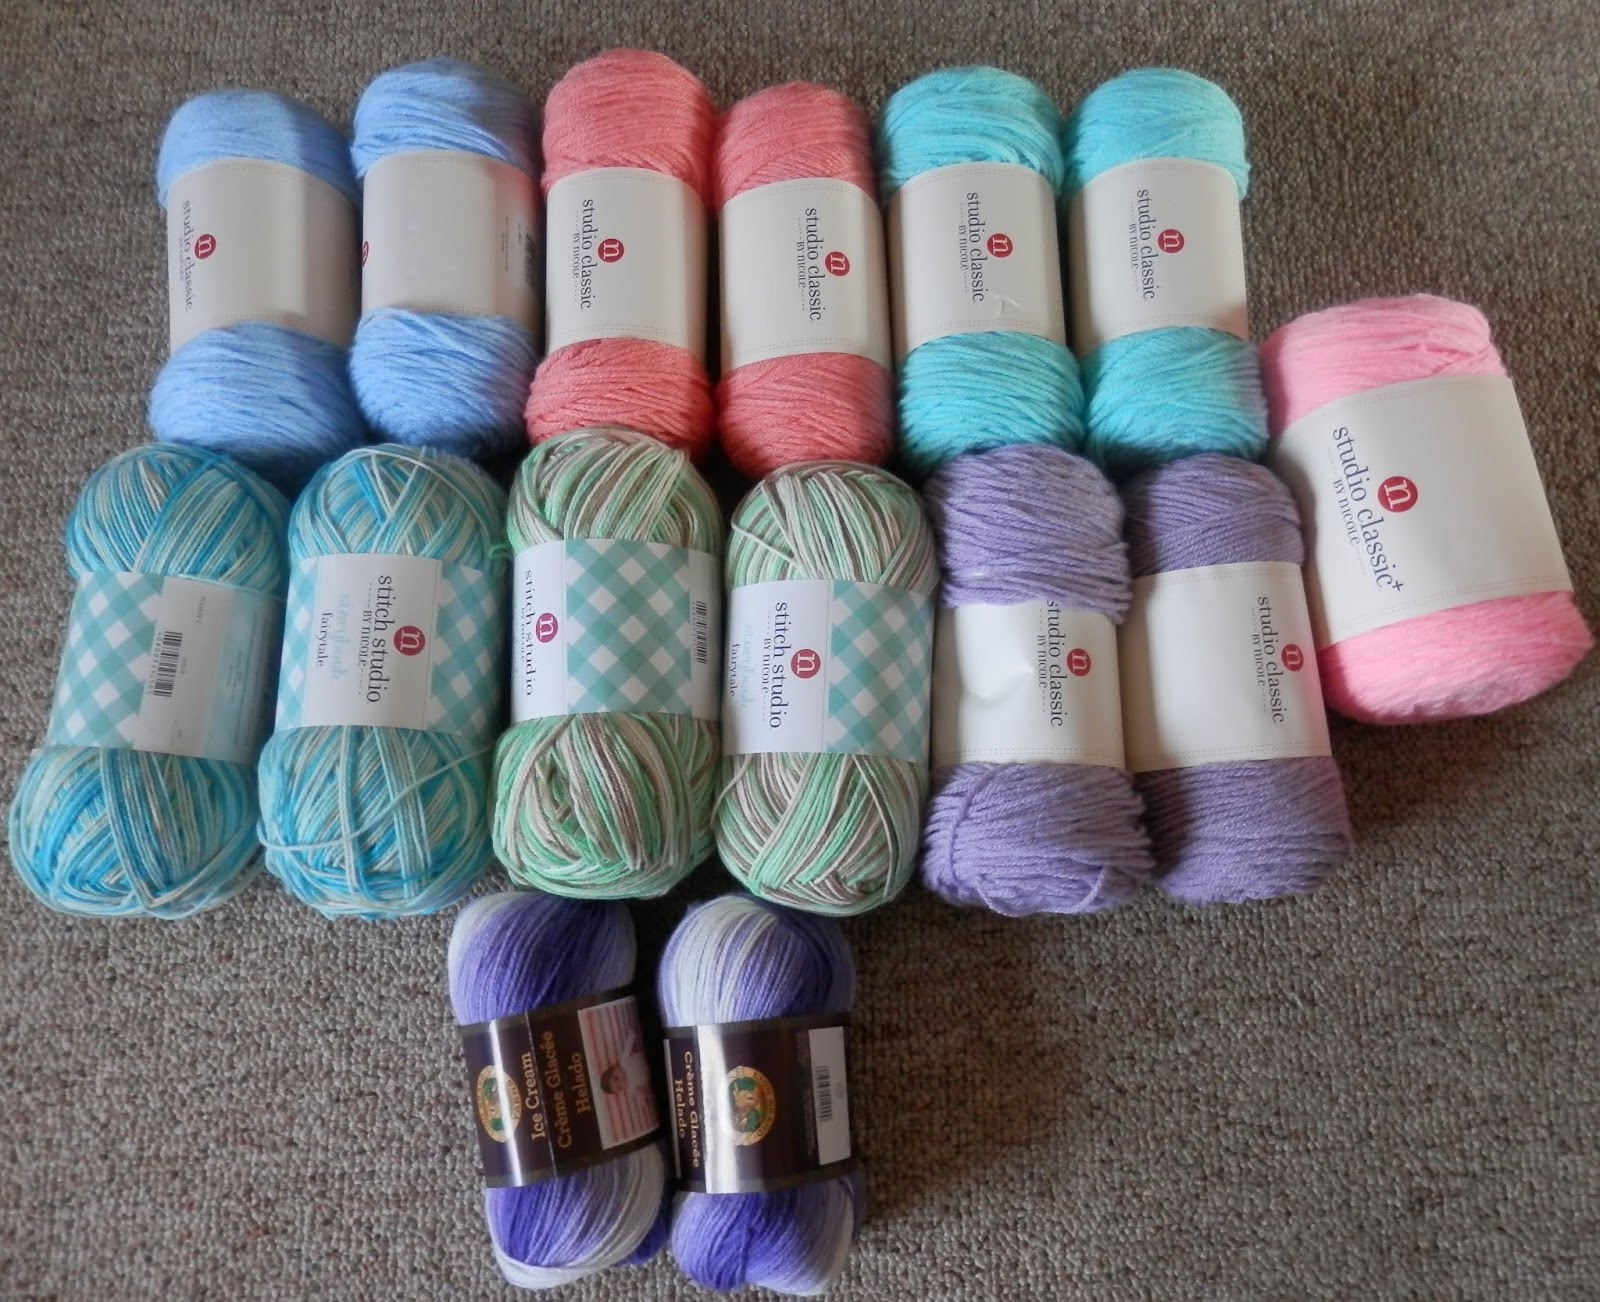 Karens Crocheted Garden of Colors: April 2019